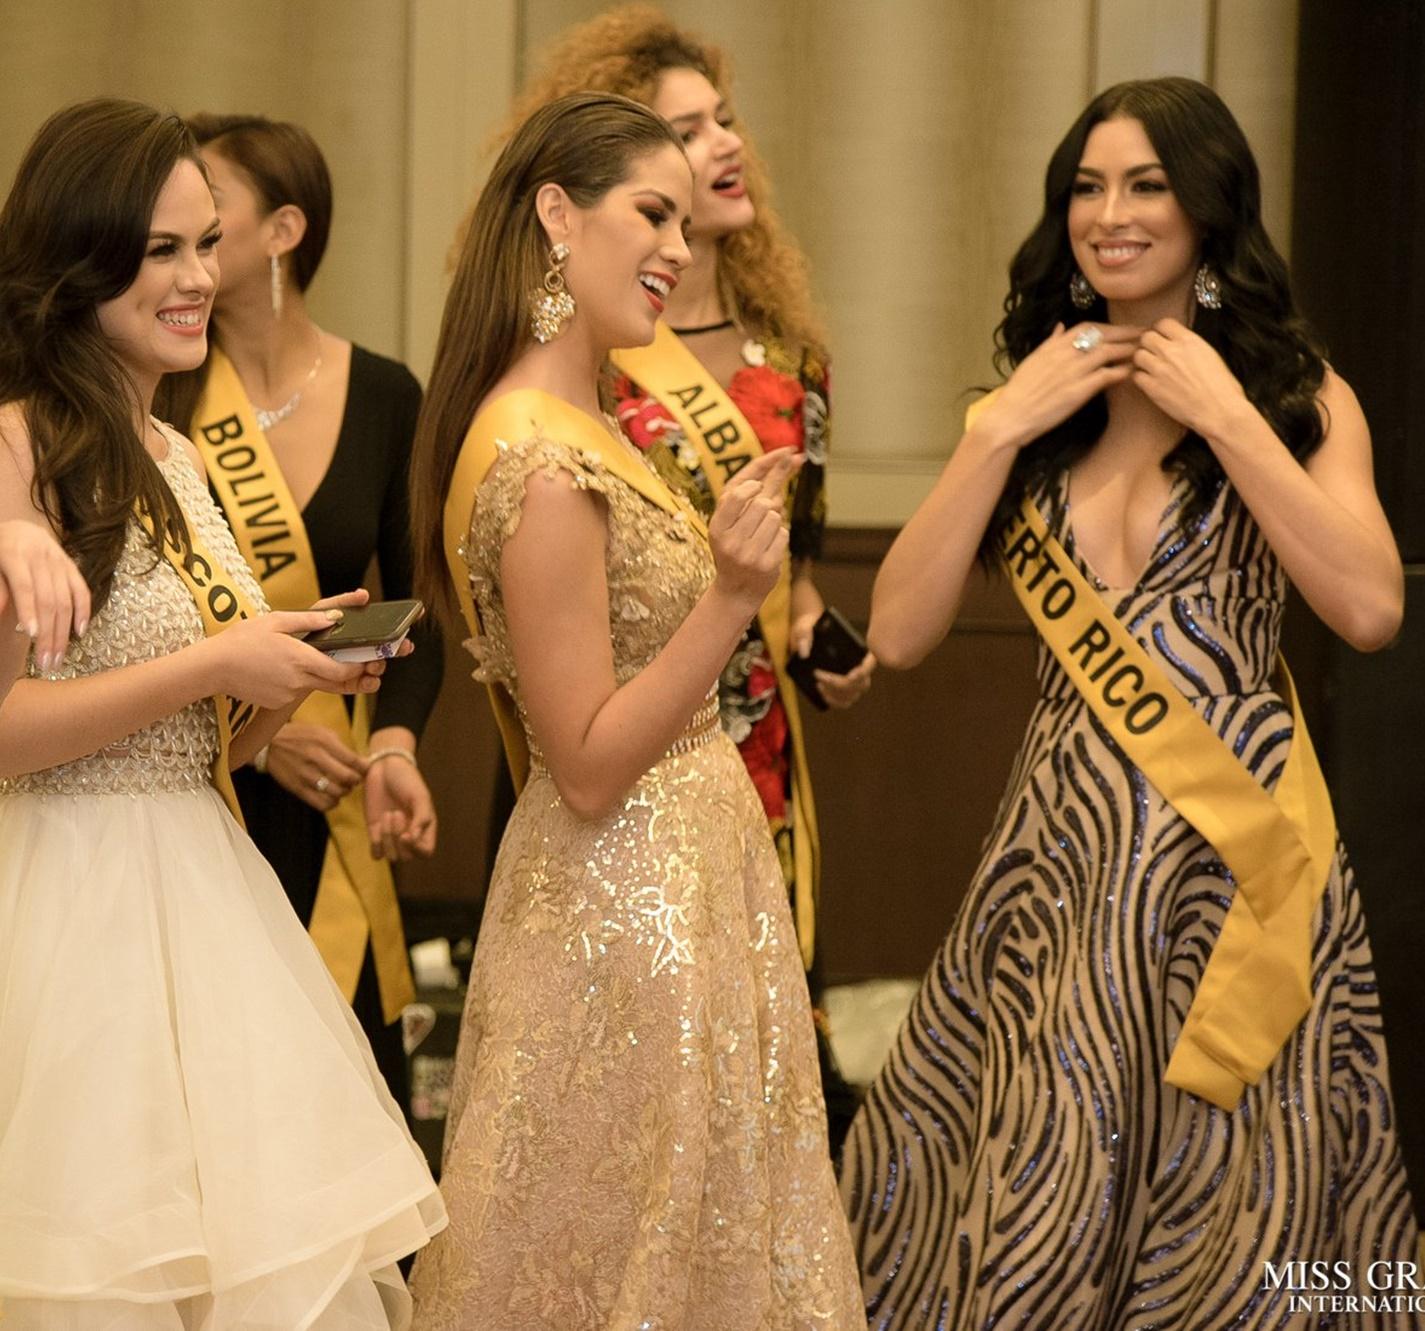 andrea moberg, top 20 de miss grand international 2018 (best national costume). - Página 12 2zjjib10